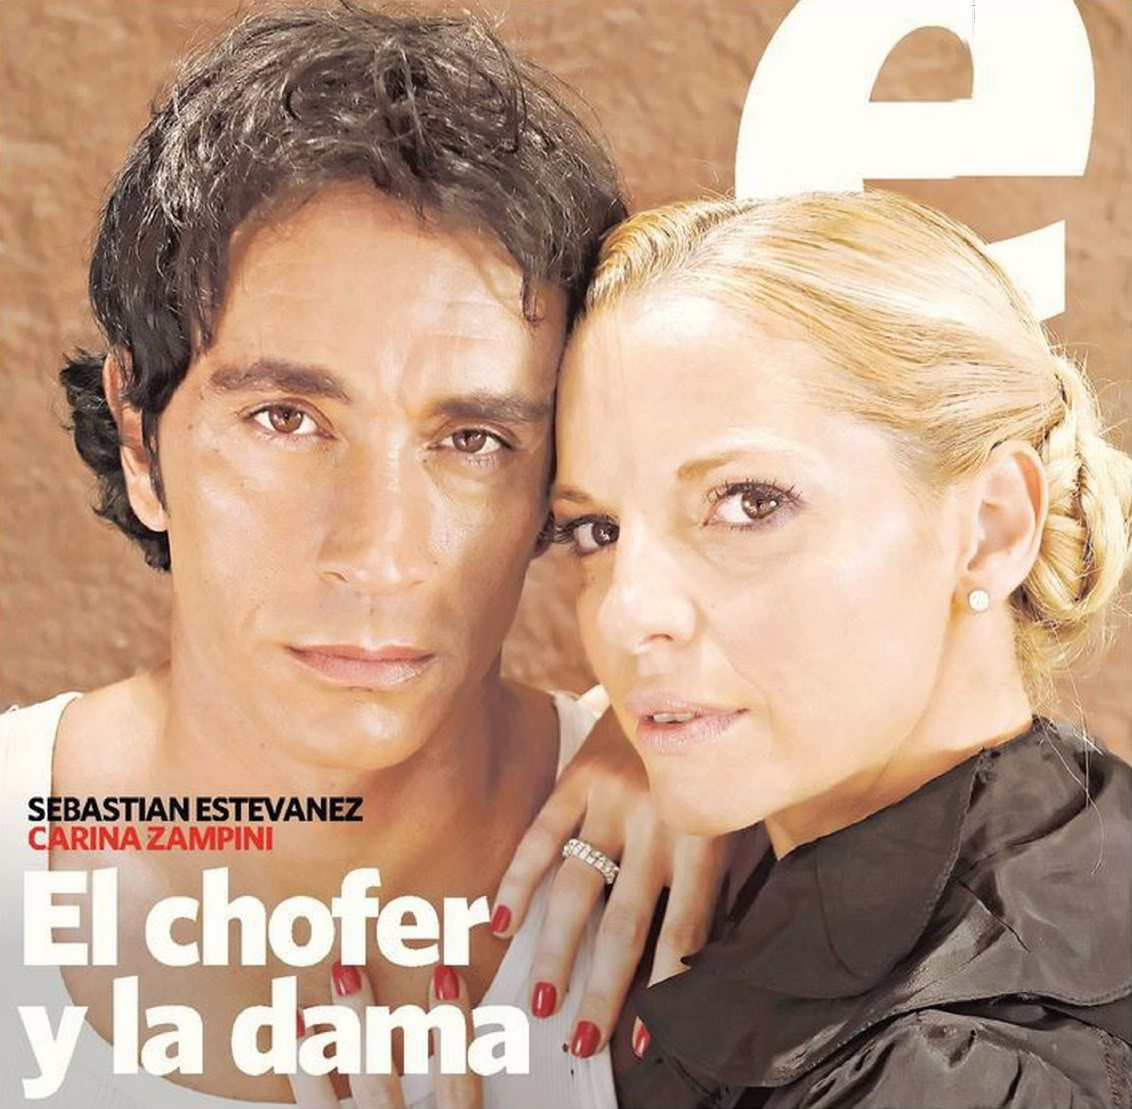 Аргентинские теленовеллы 2012 - Página 5 Seba-Carina-clarin000